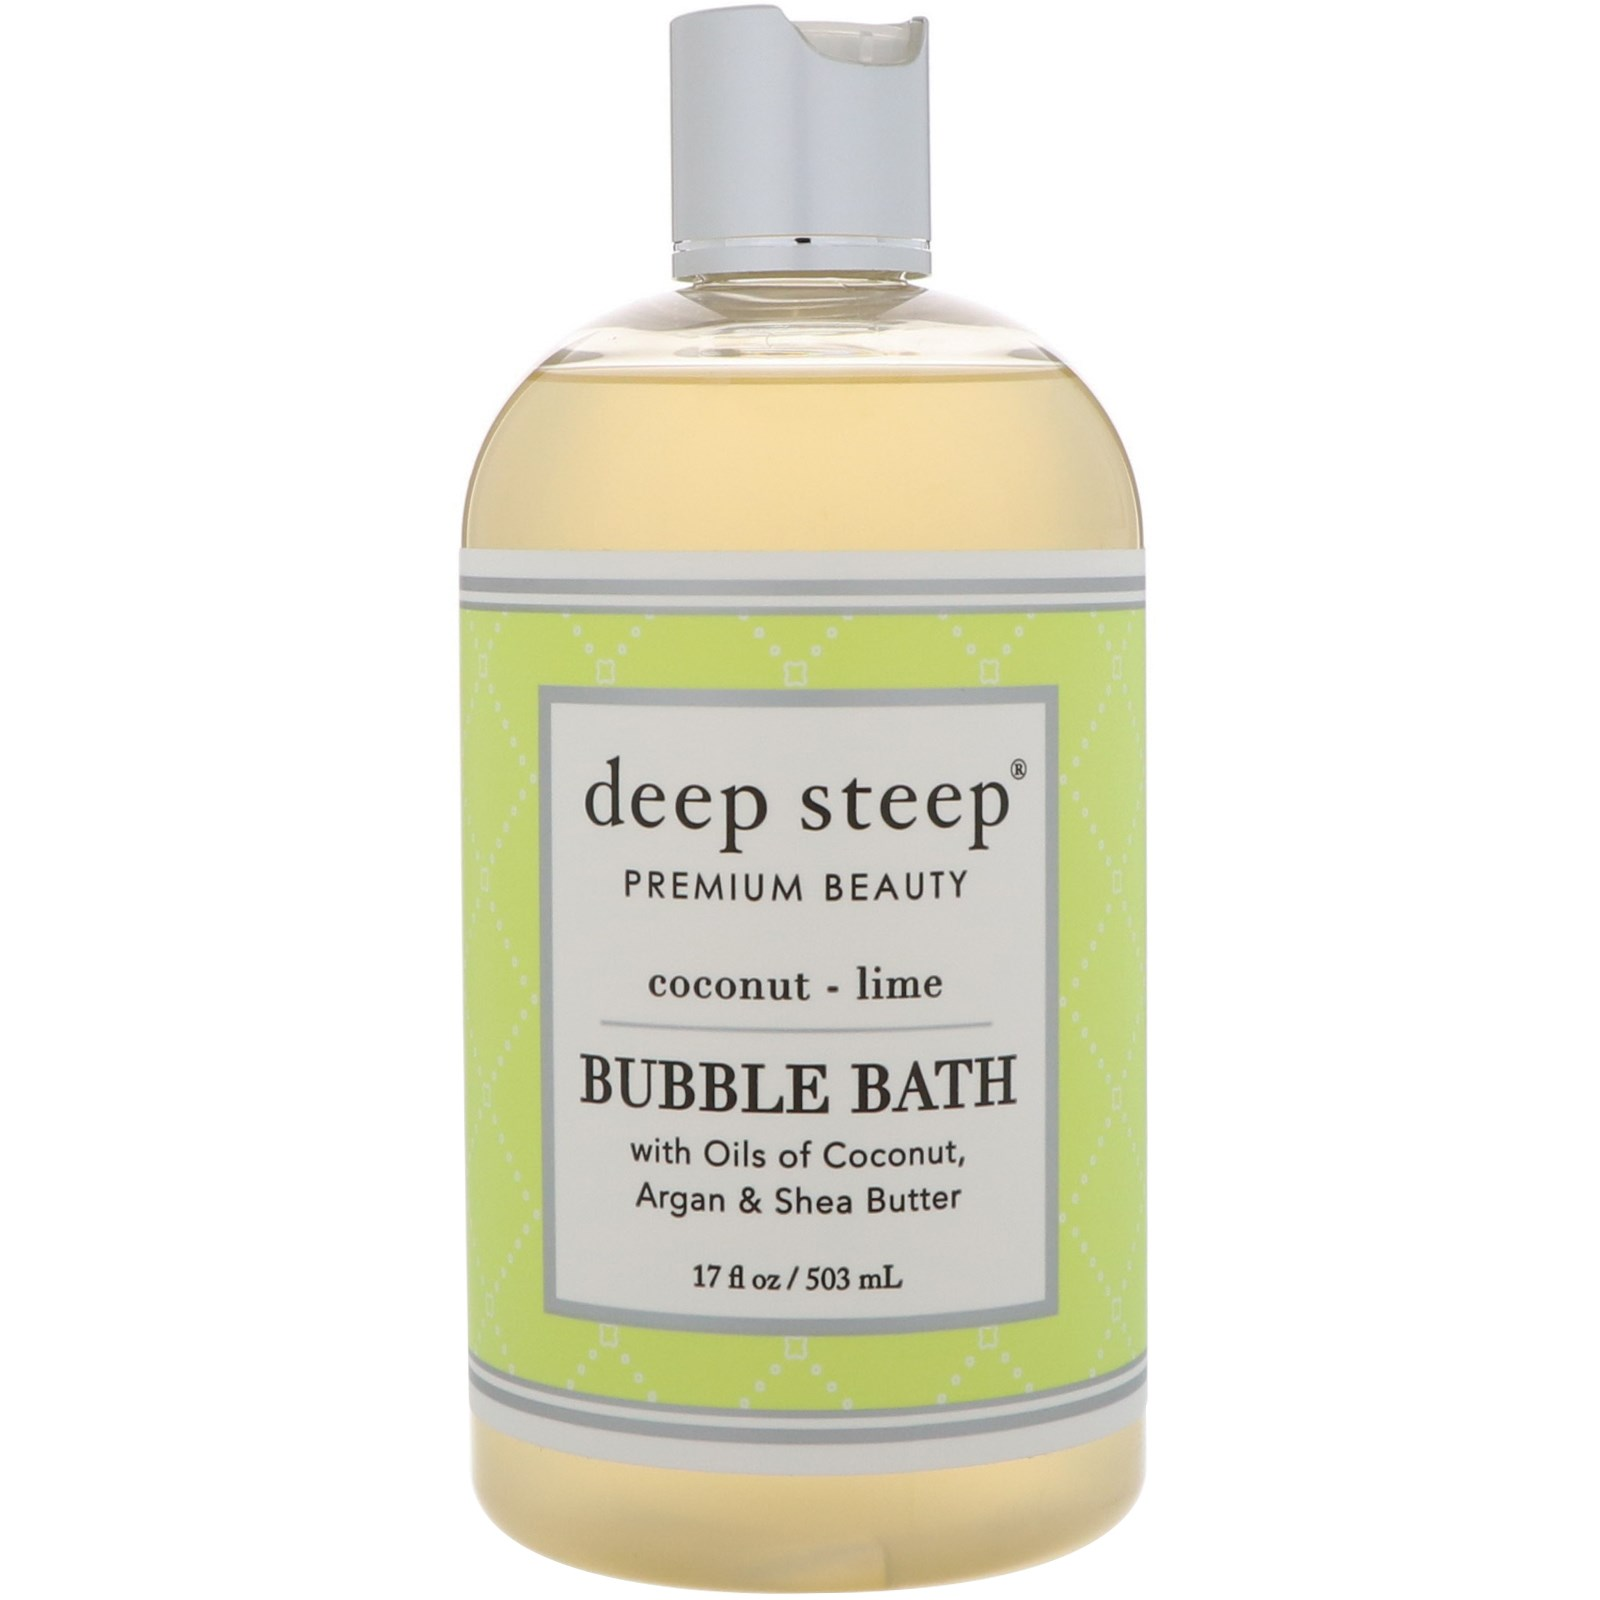 Deep Steep, Bubble Bath, Coconut Lime, 17 fl oz (503 ml)